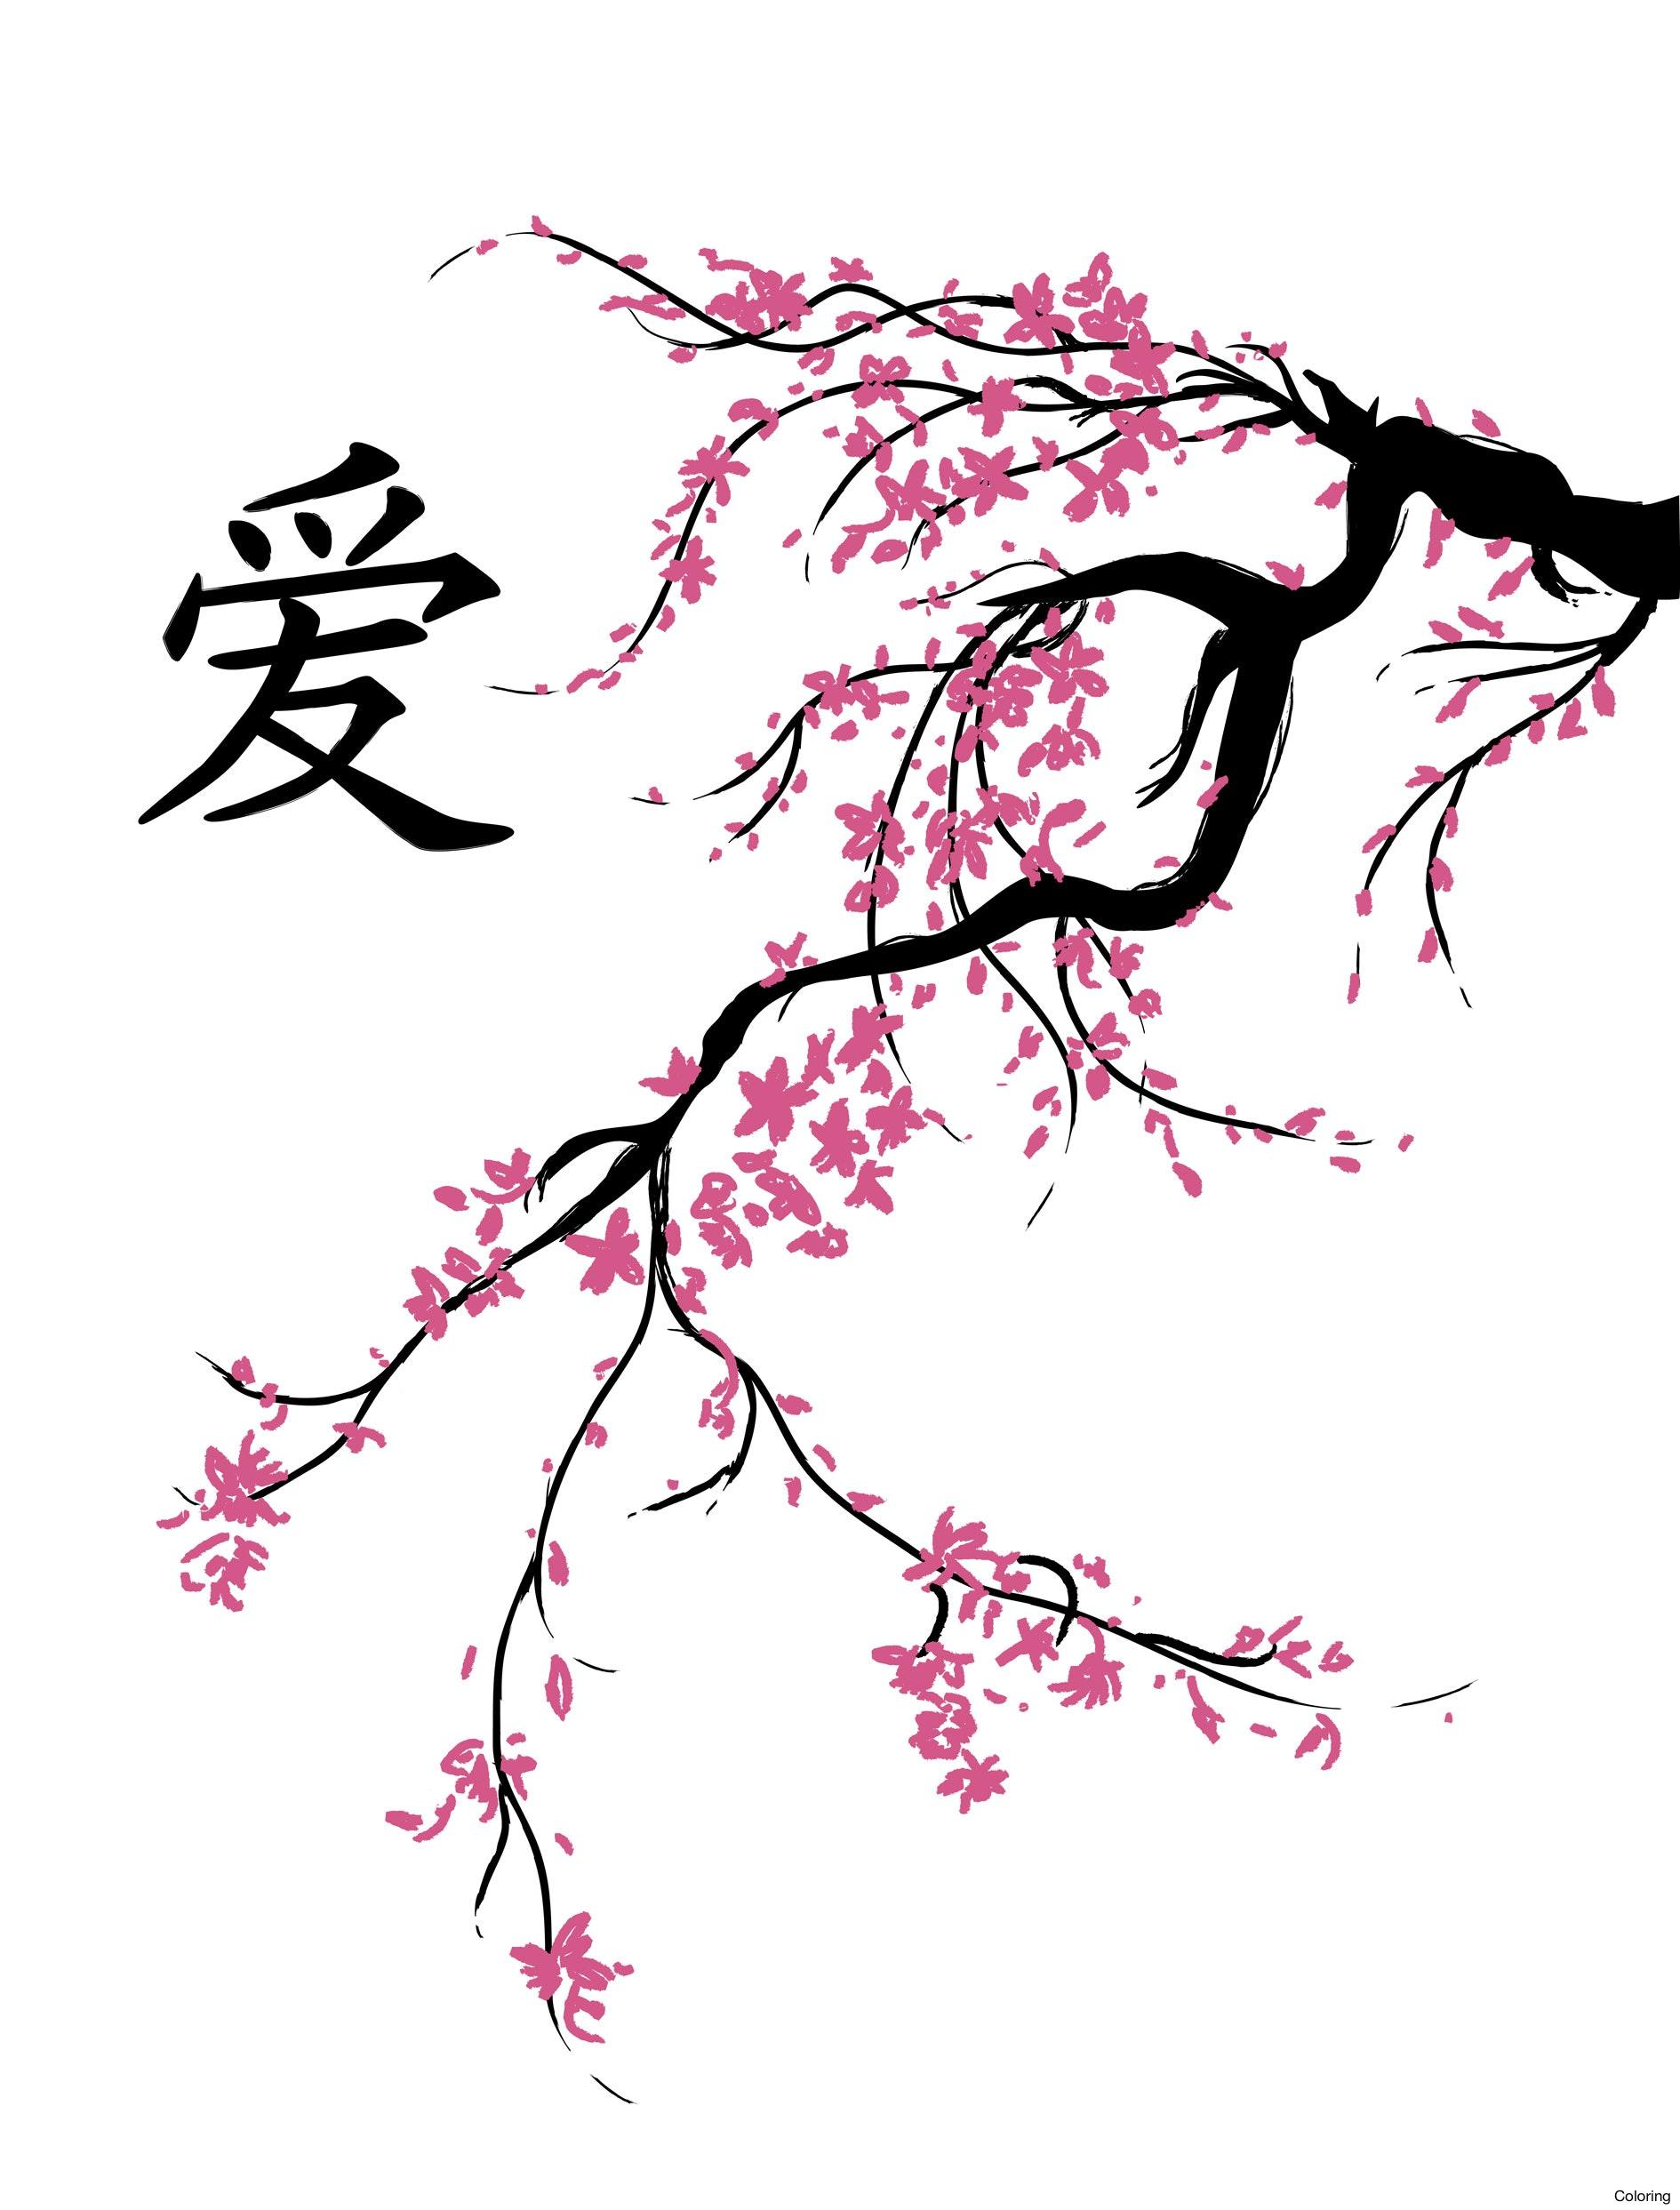 1890x2486 Drawn Sakura Blossom Japenese 7 Cherry Blossoms Drawings Coloring